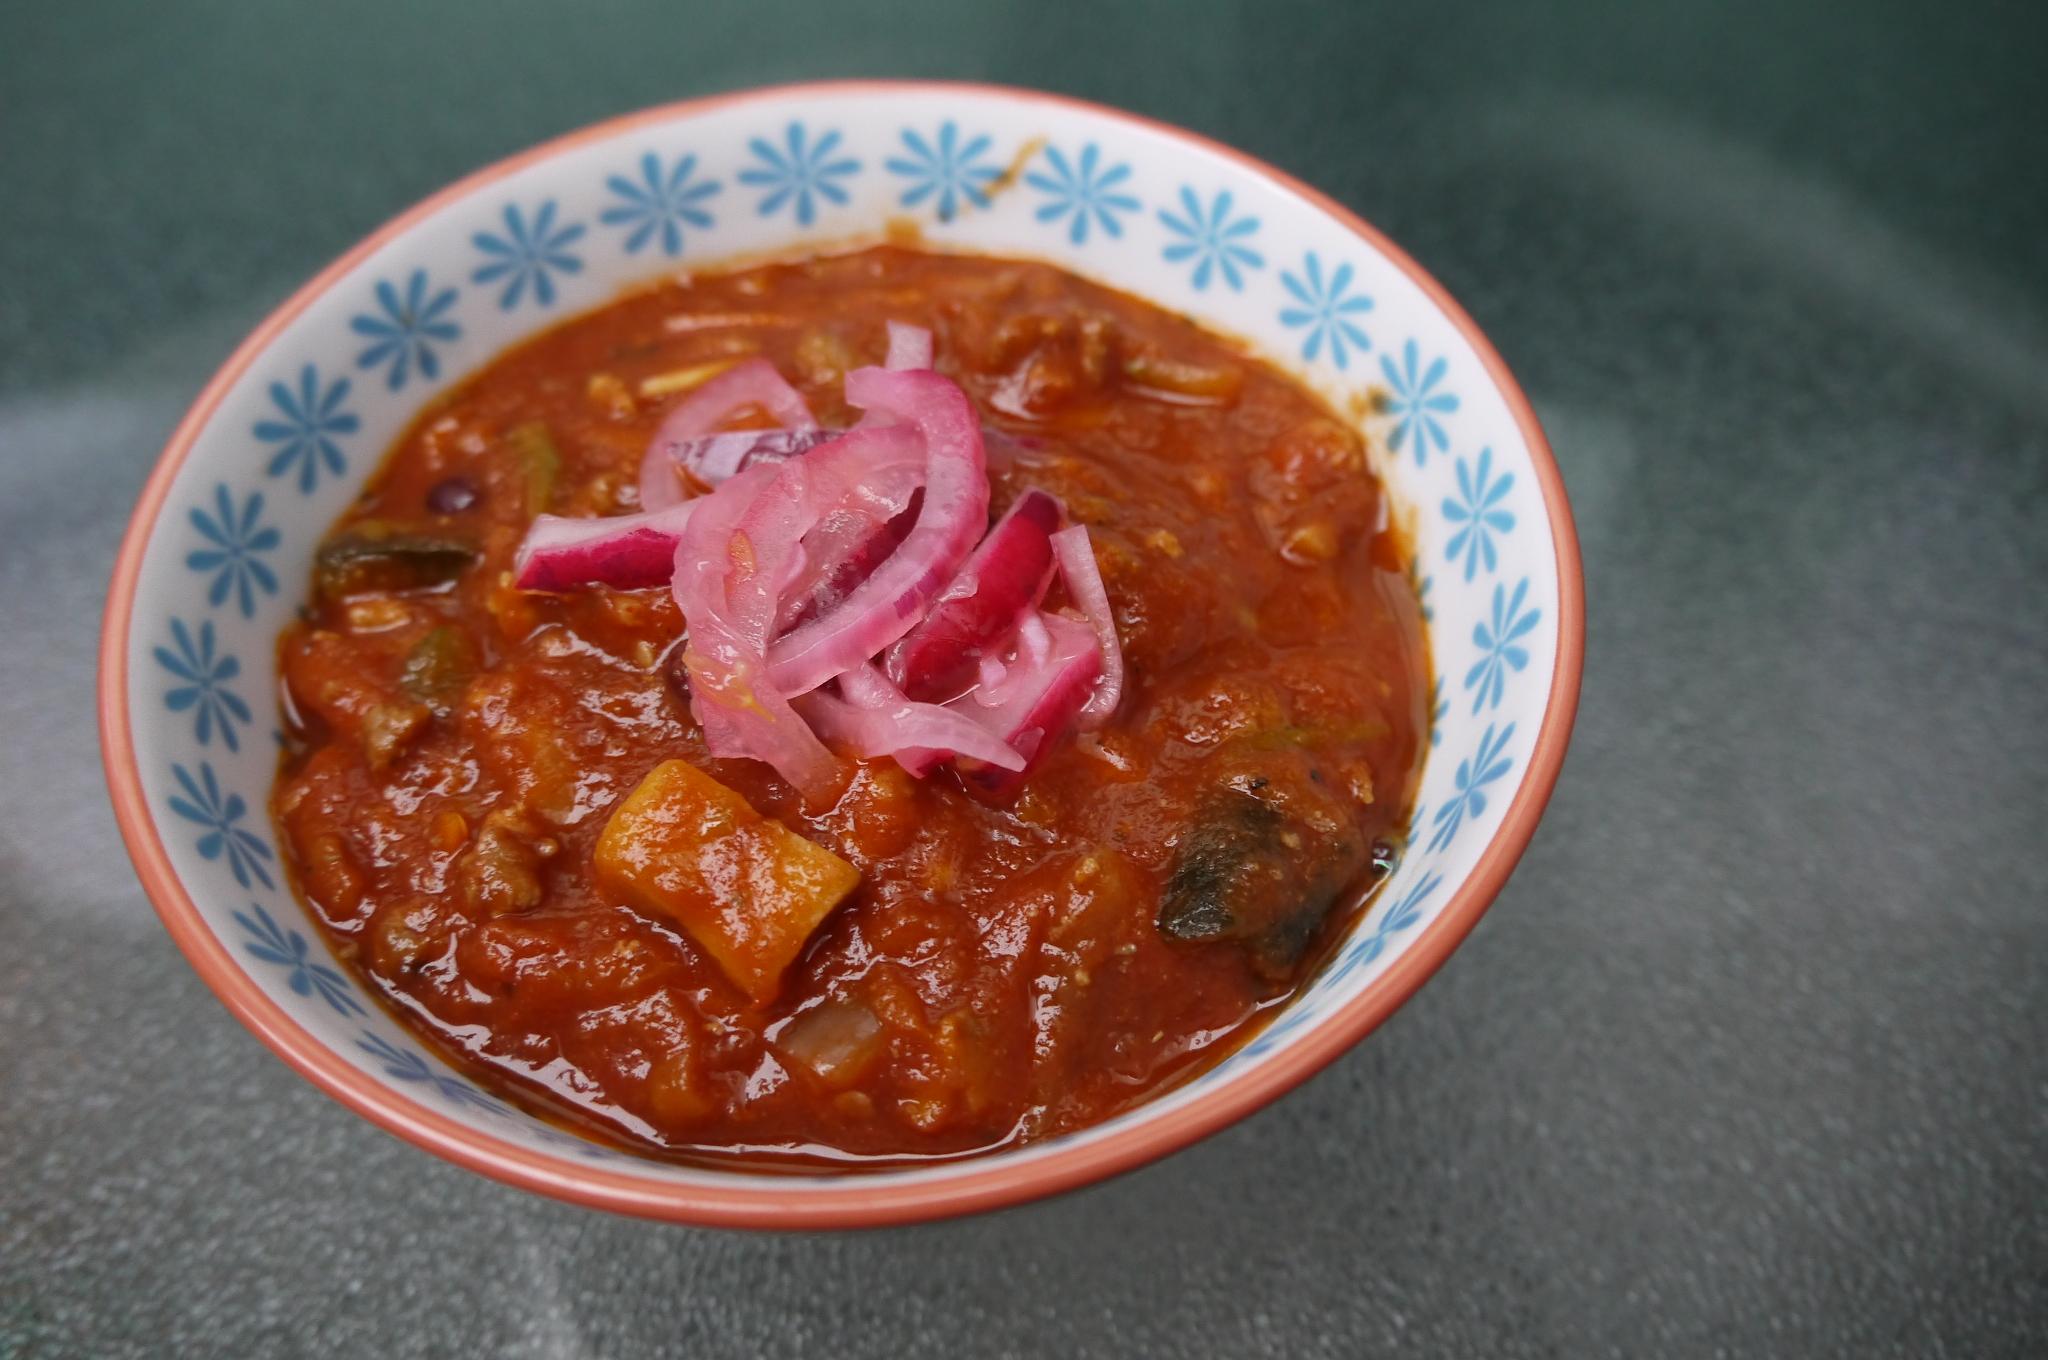 Turkey and Chocolate Chili - trustinkim